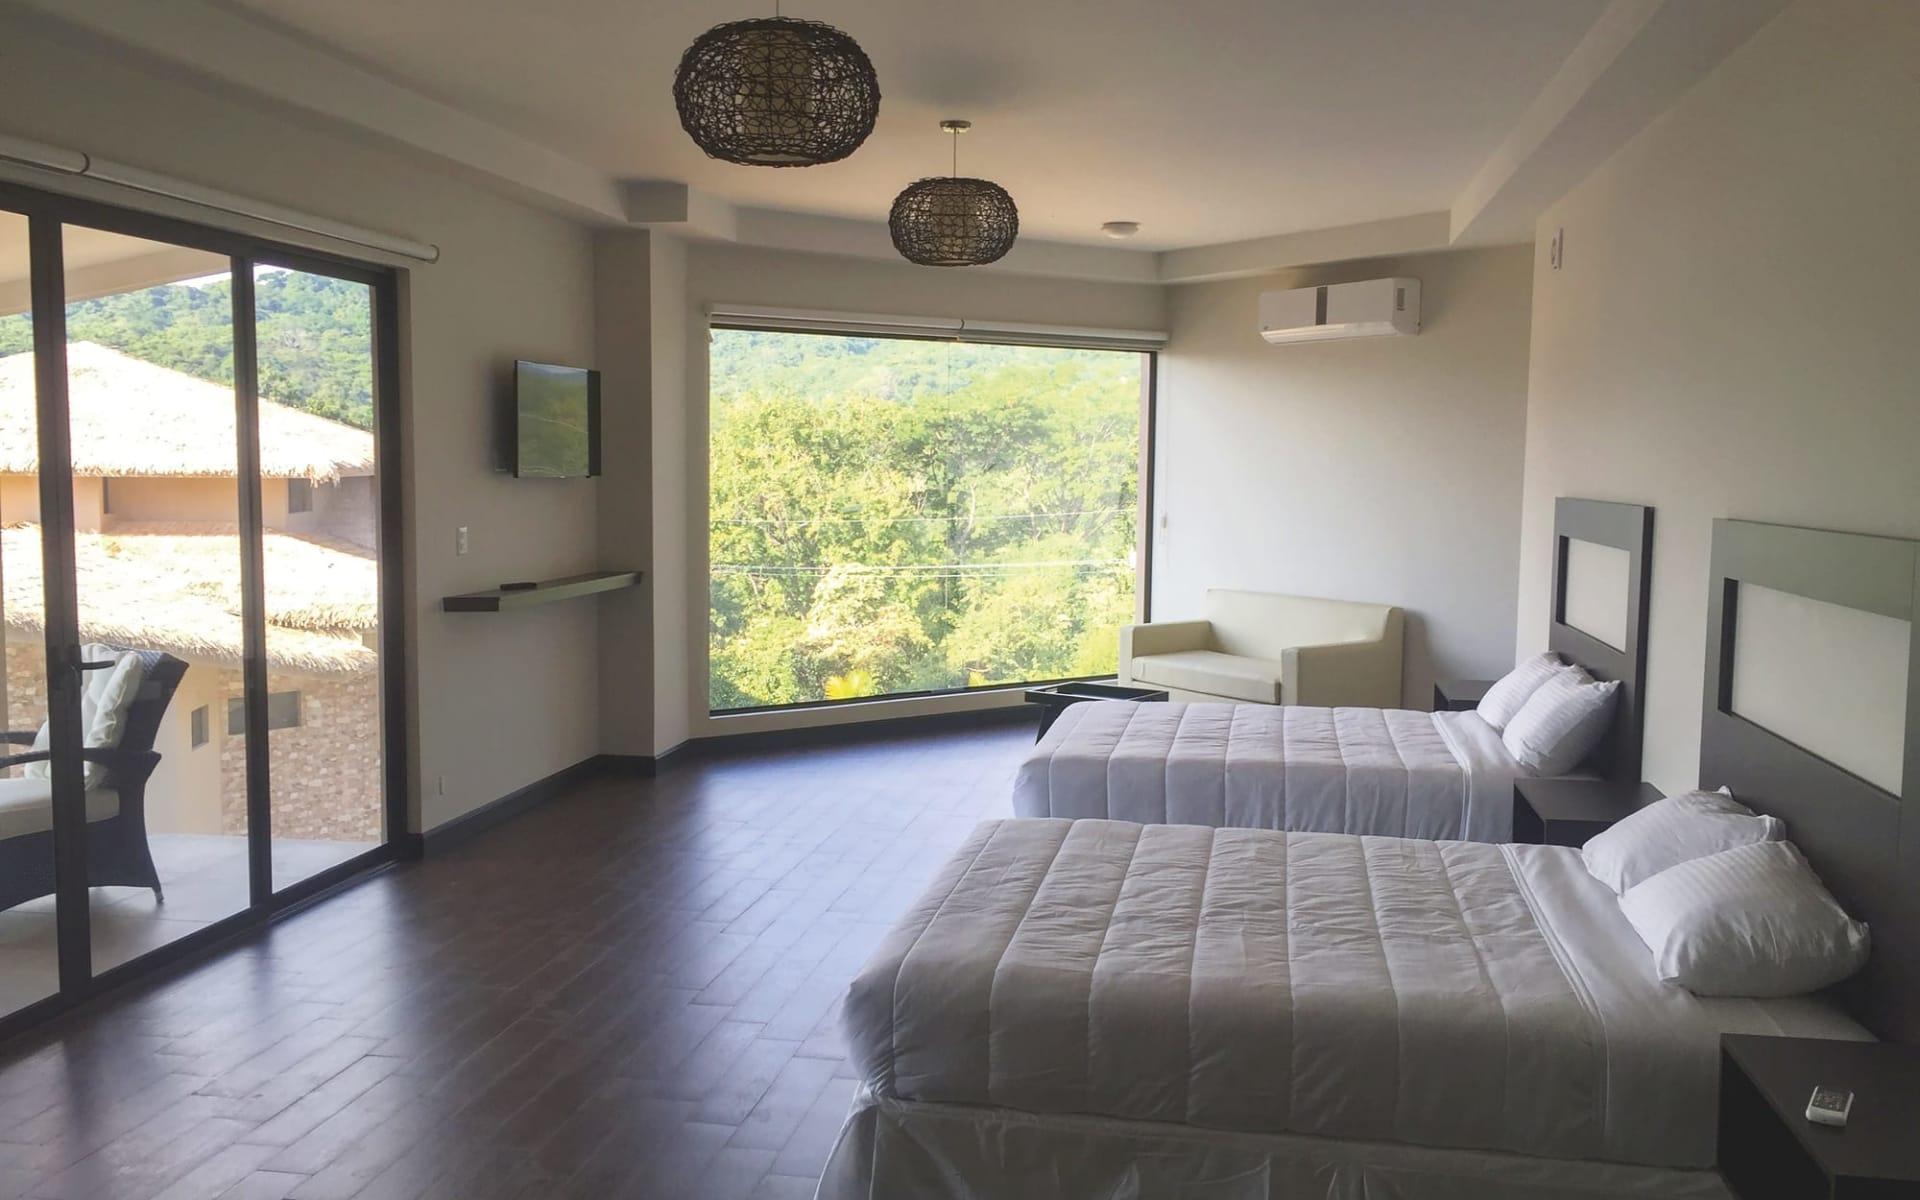 Nammbú Beachfront Bungalows in Playa Carillo:  Nammbu Hotel Costa Rica - Deluxe Zimmer c Latinconnect